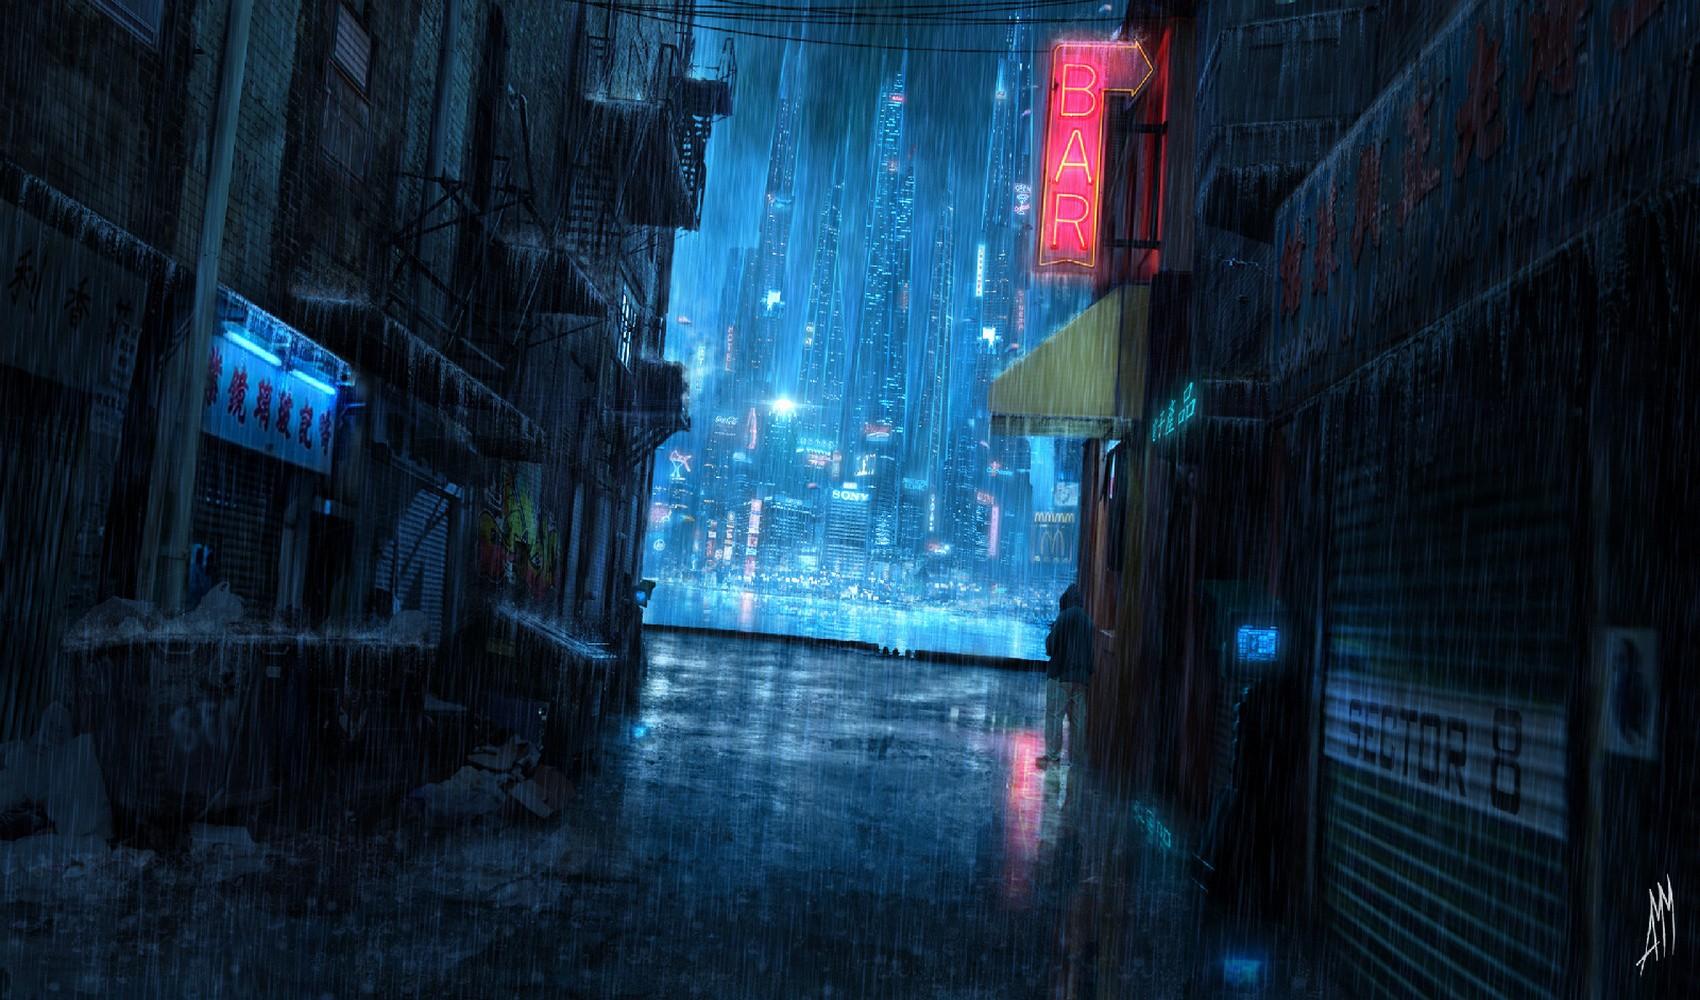 General 1700x1000 rain night cyberpunk futuristic city science fiction futuristic cityscape apocalyptic cyan